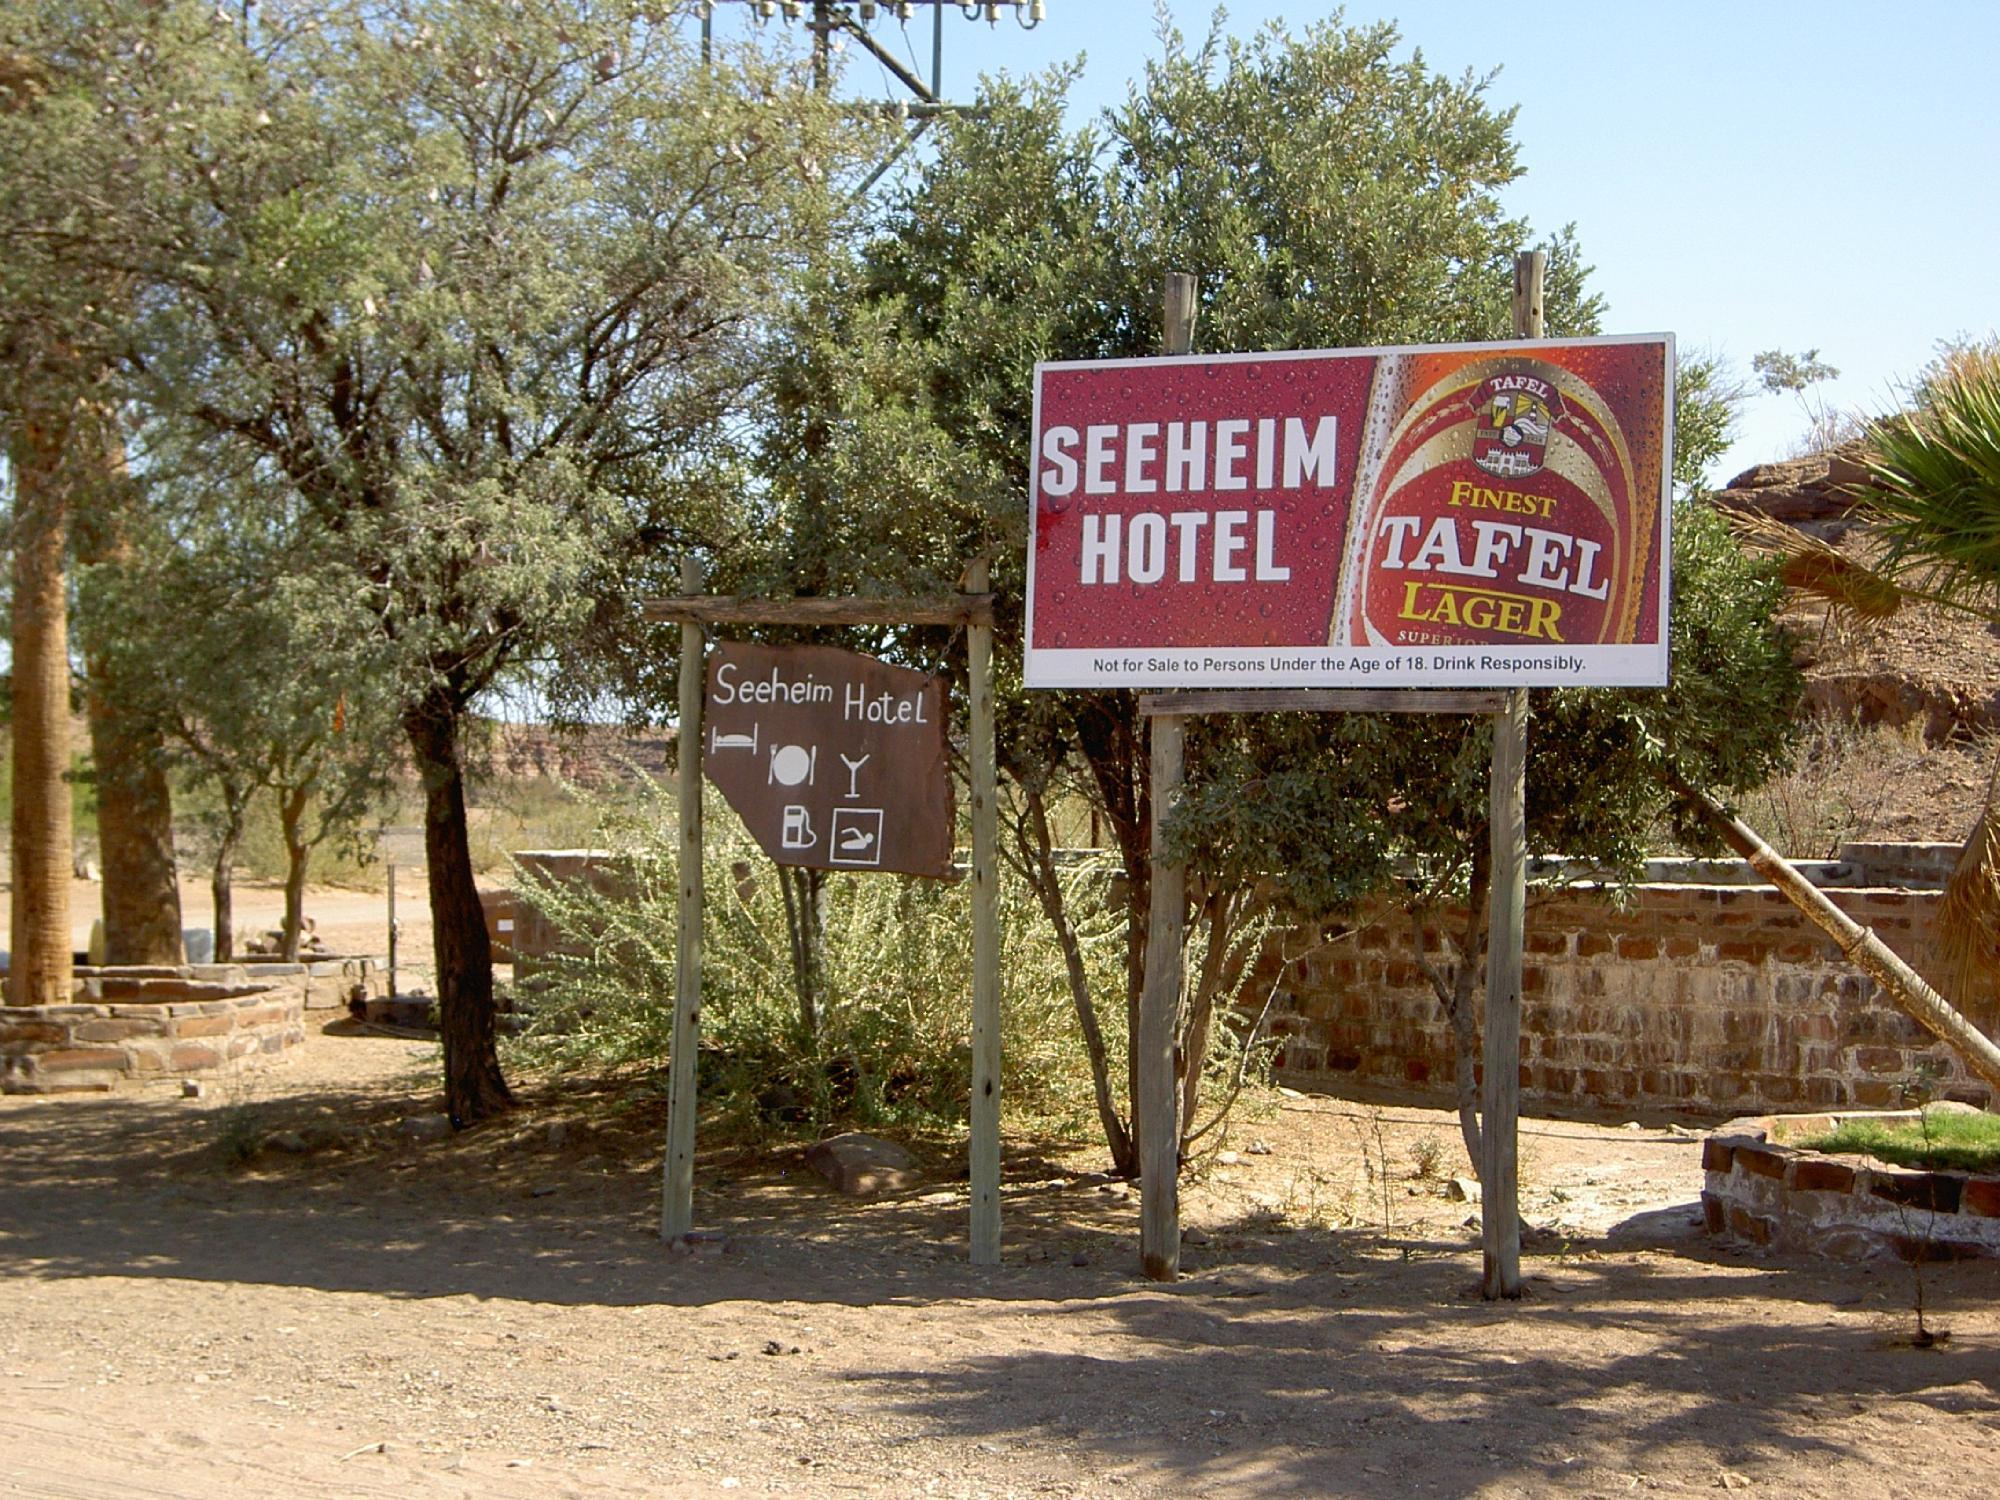 Seeheim Hotel